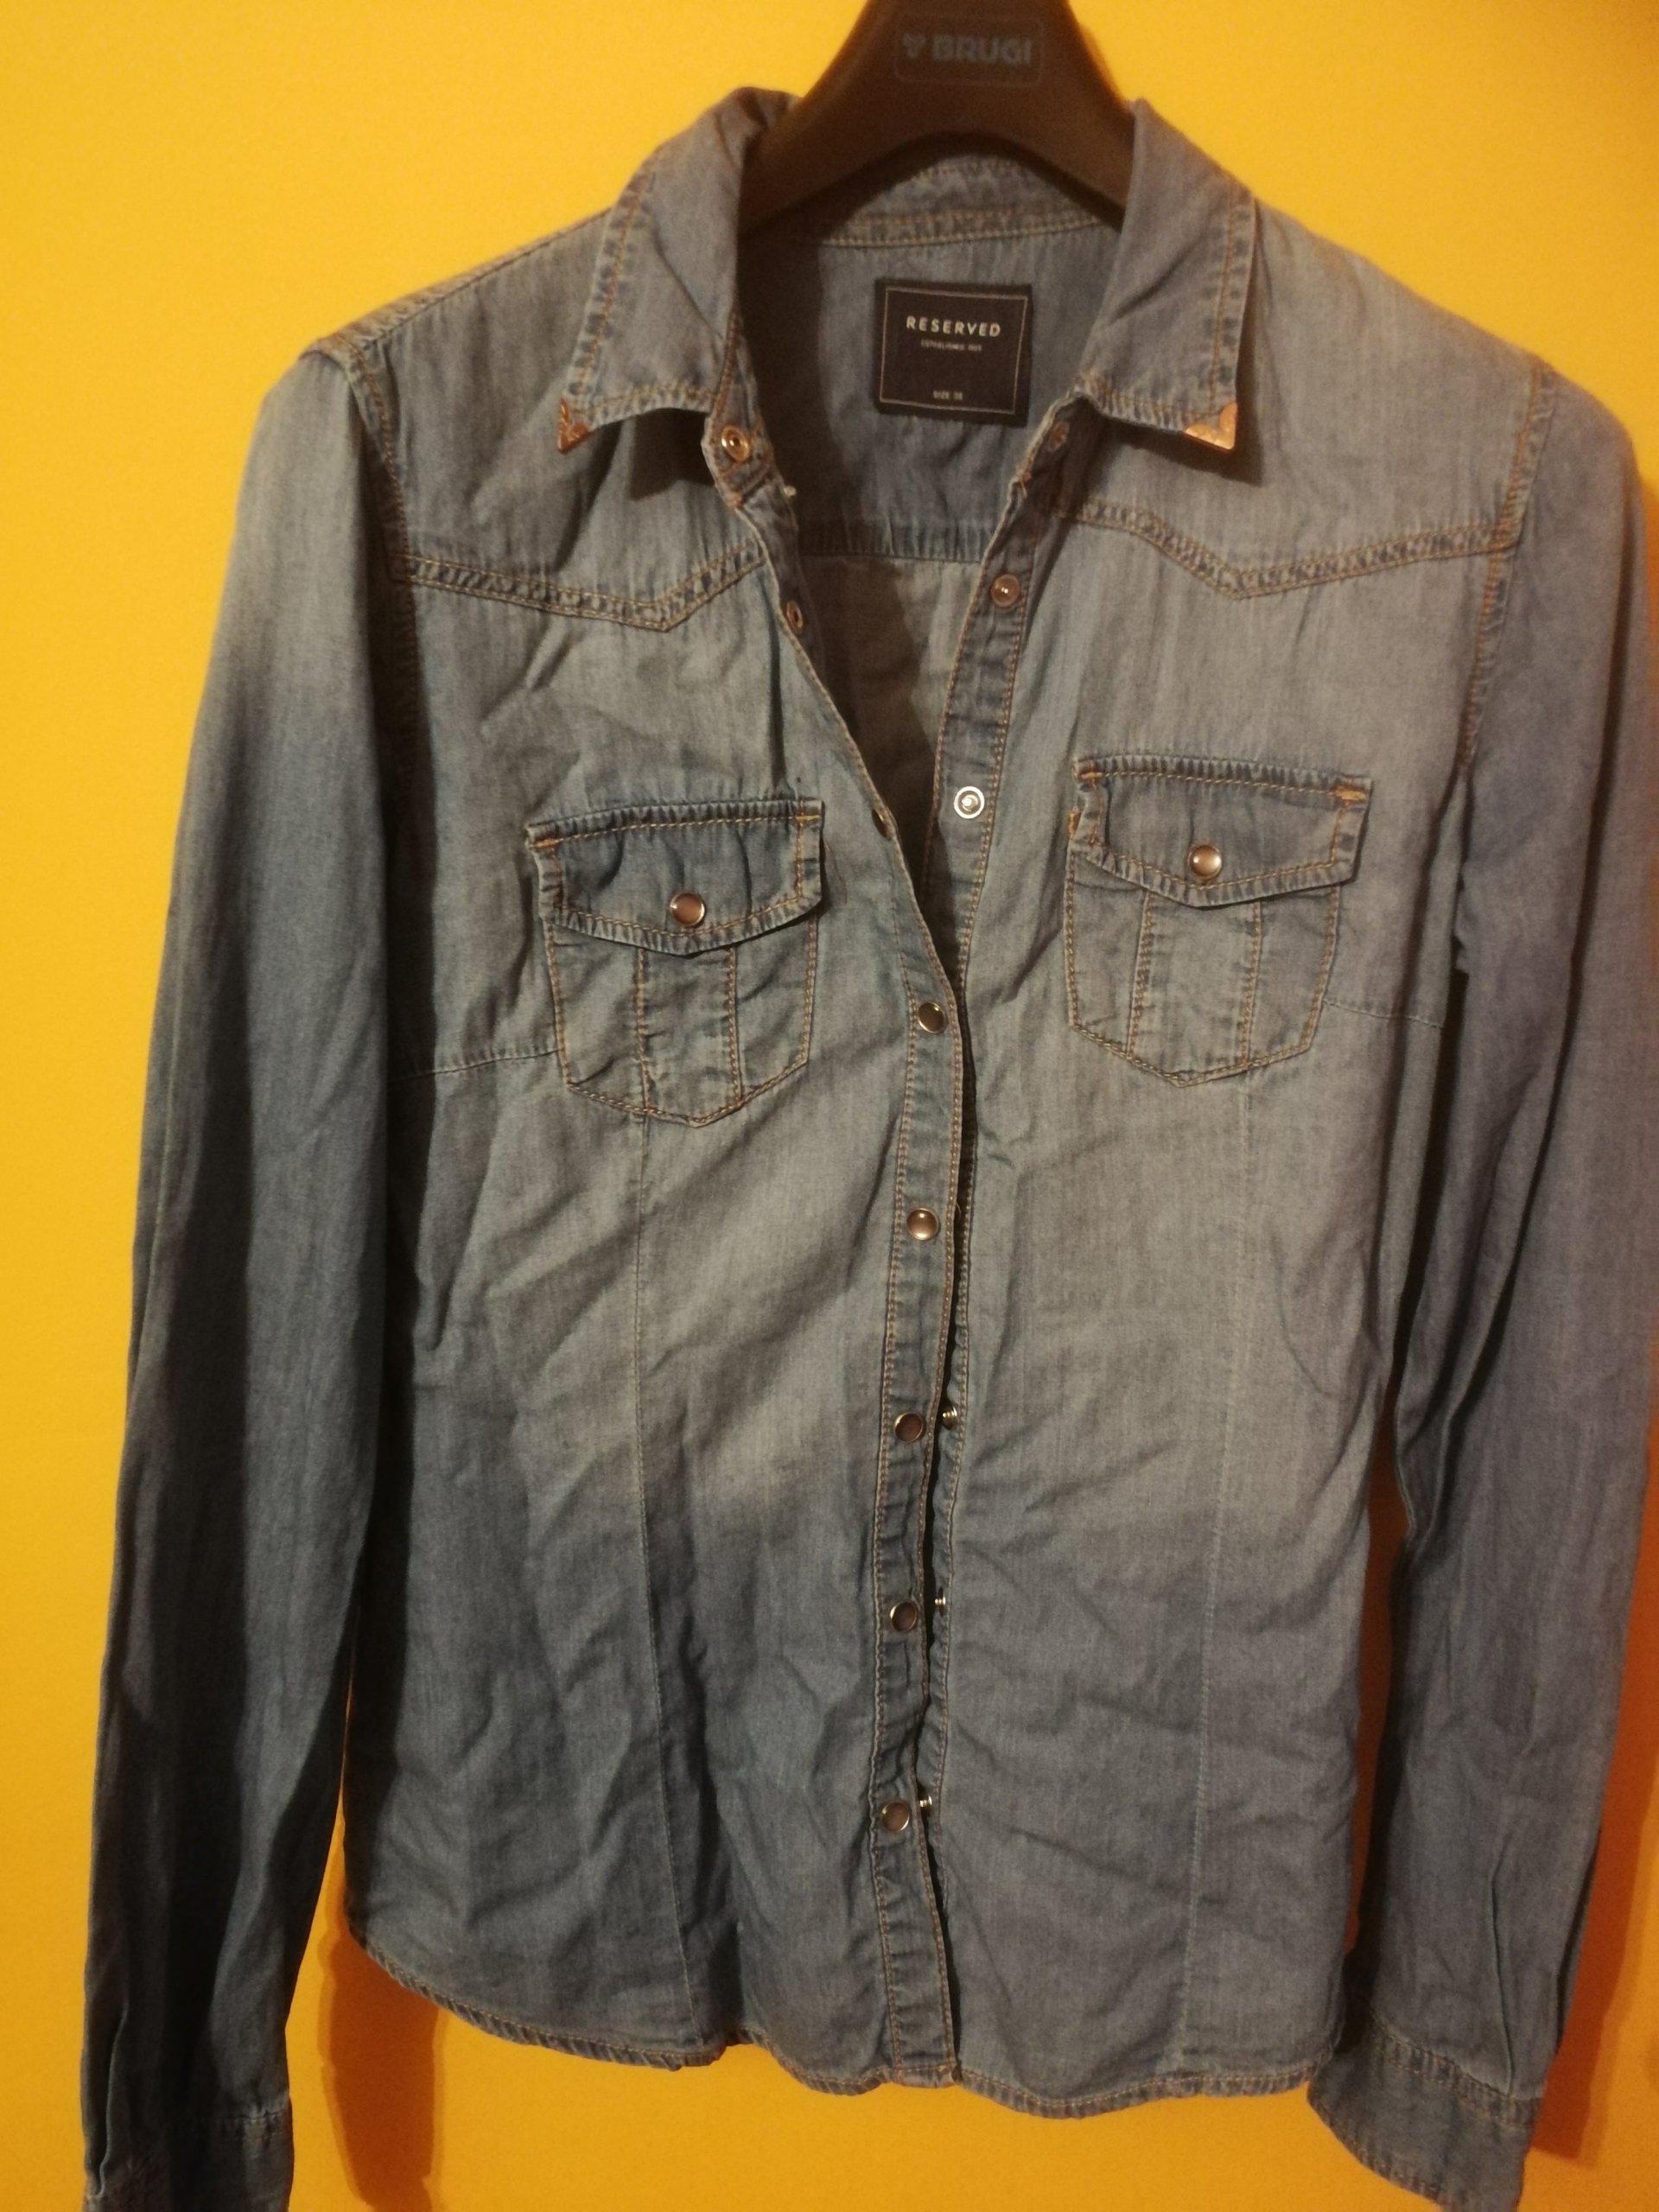 d14e0724 Koszula jeansowa dżinsowa jak NOWA ESMARA 36 S - 7242535571 ...